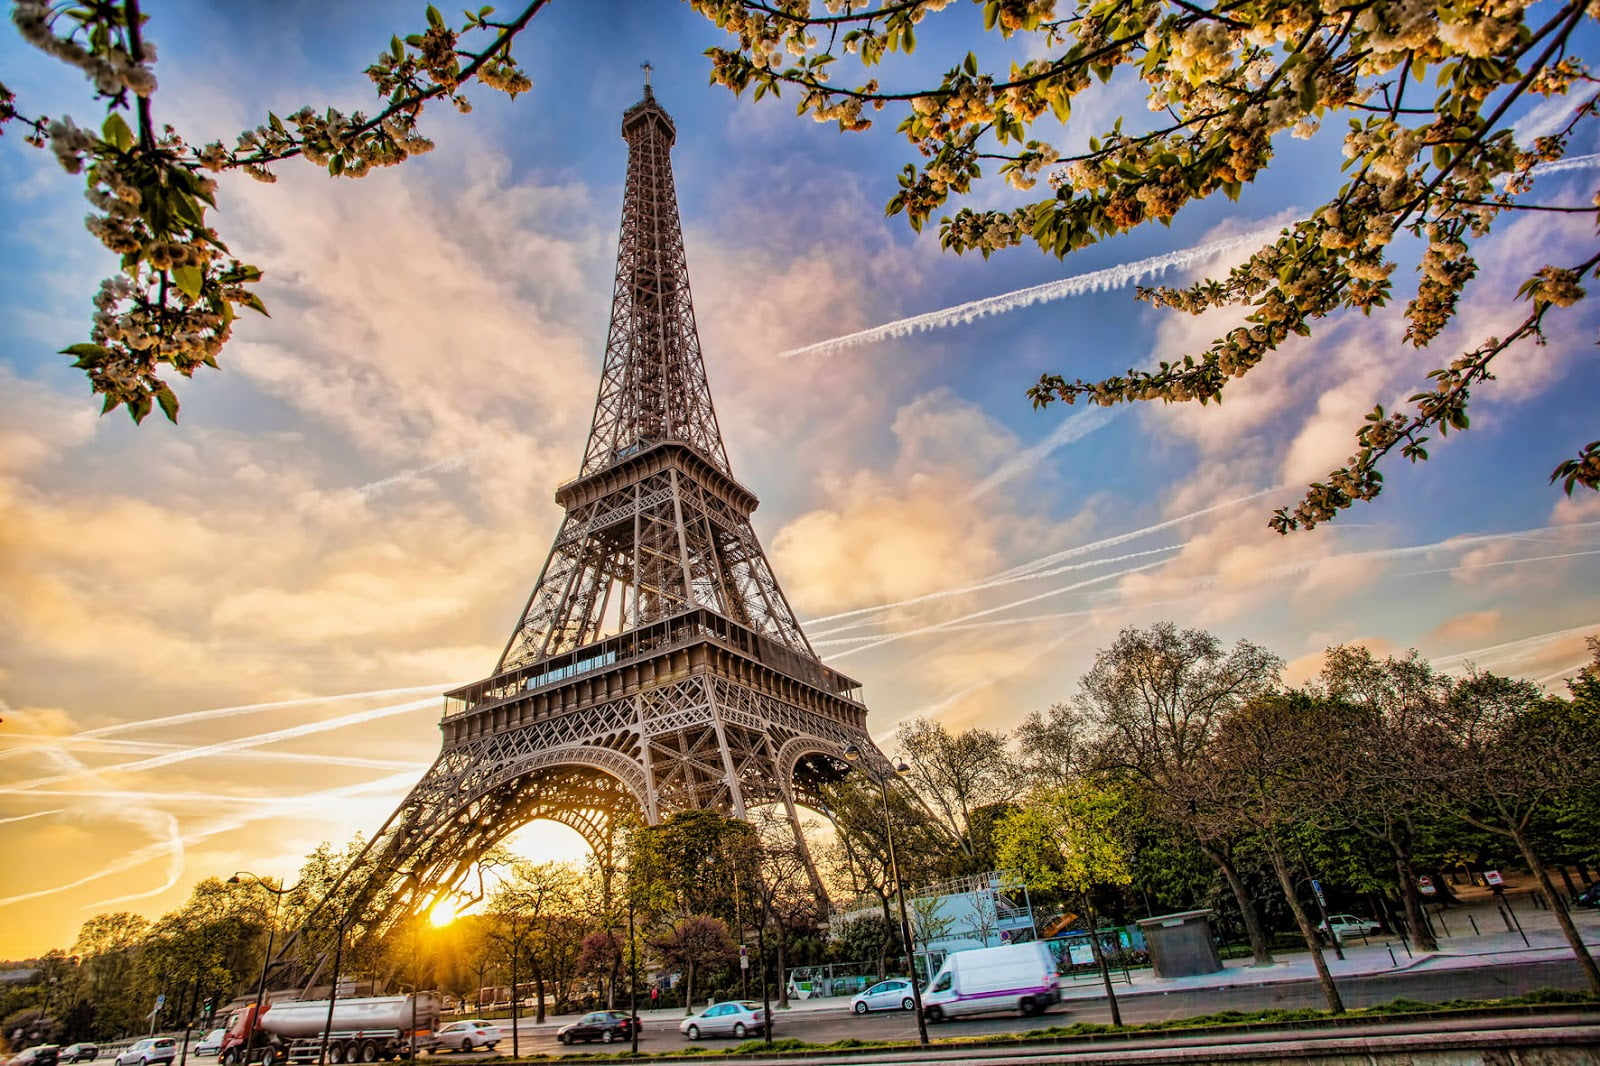 Europa Paris Madrid Roma